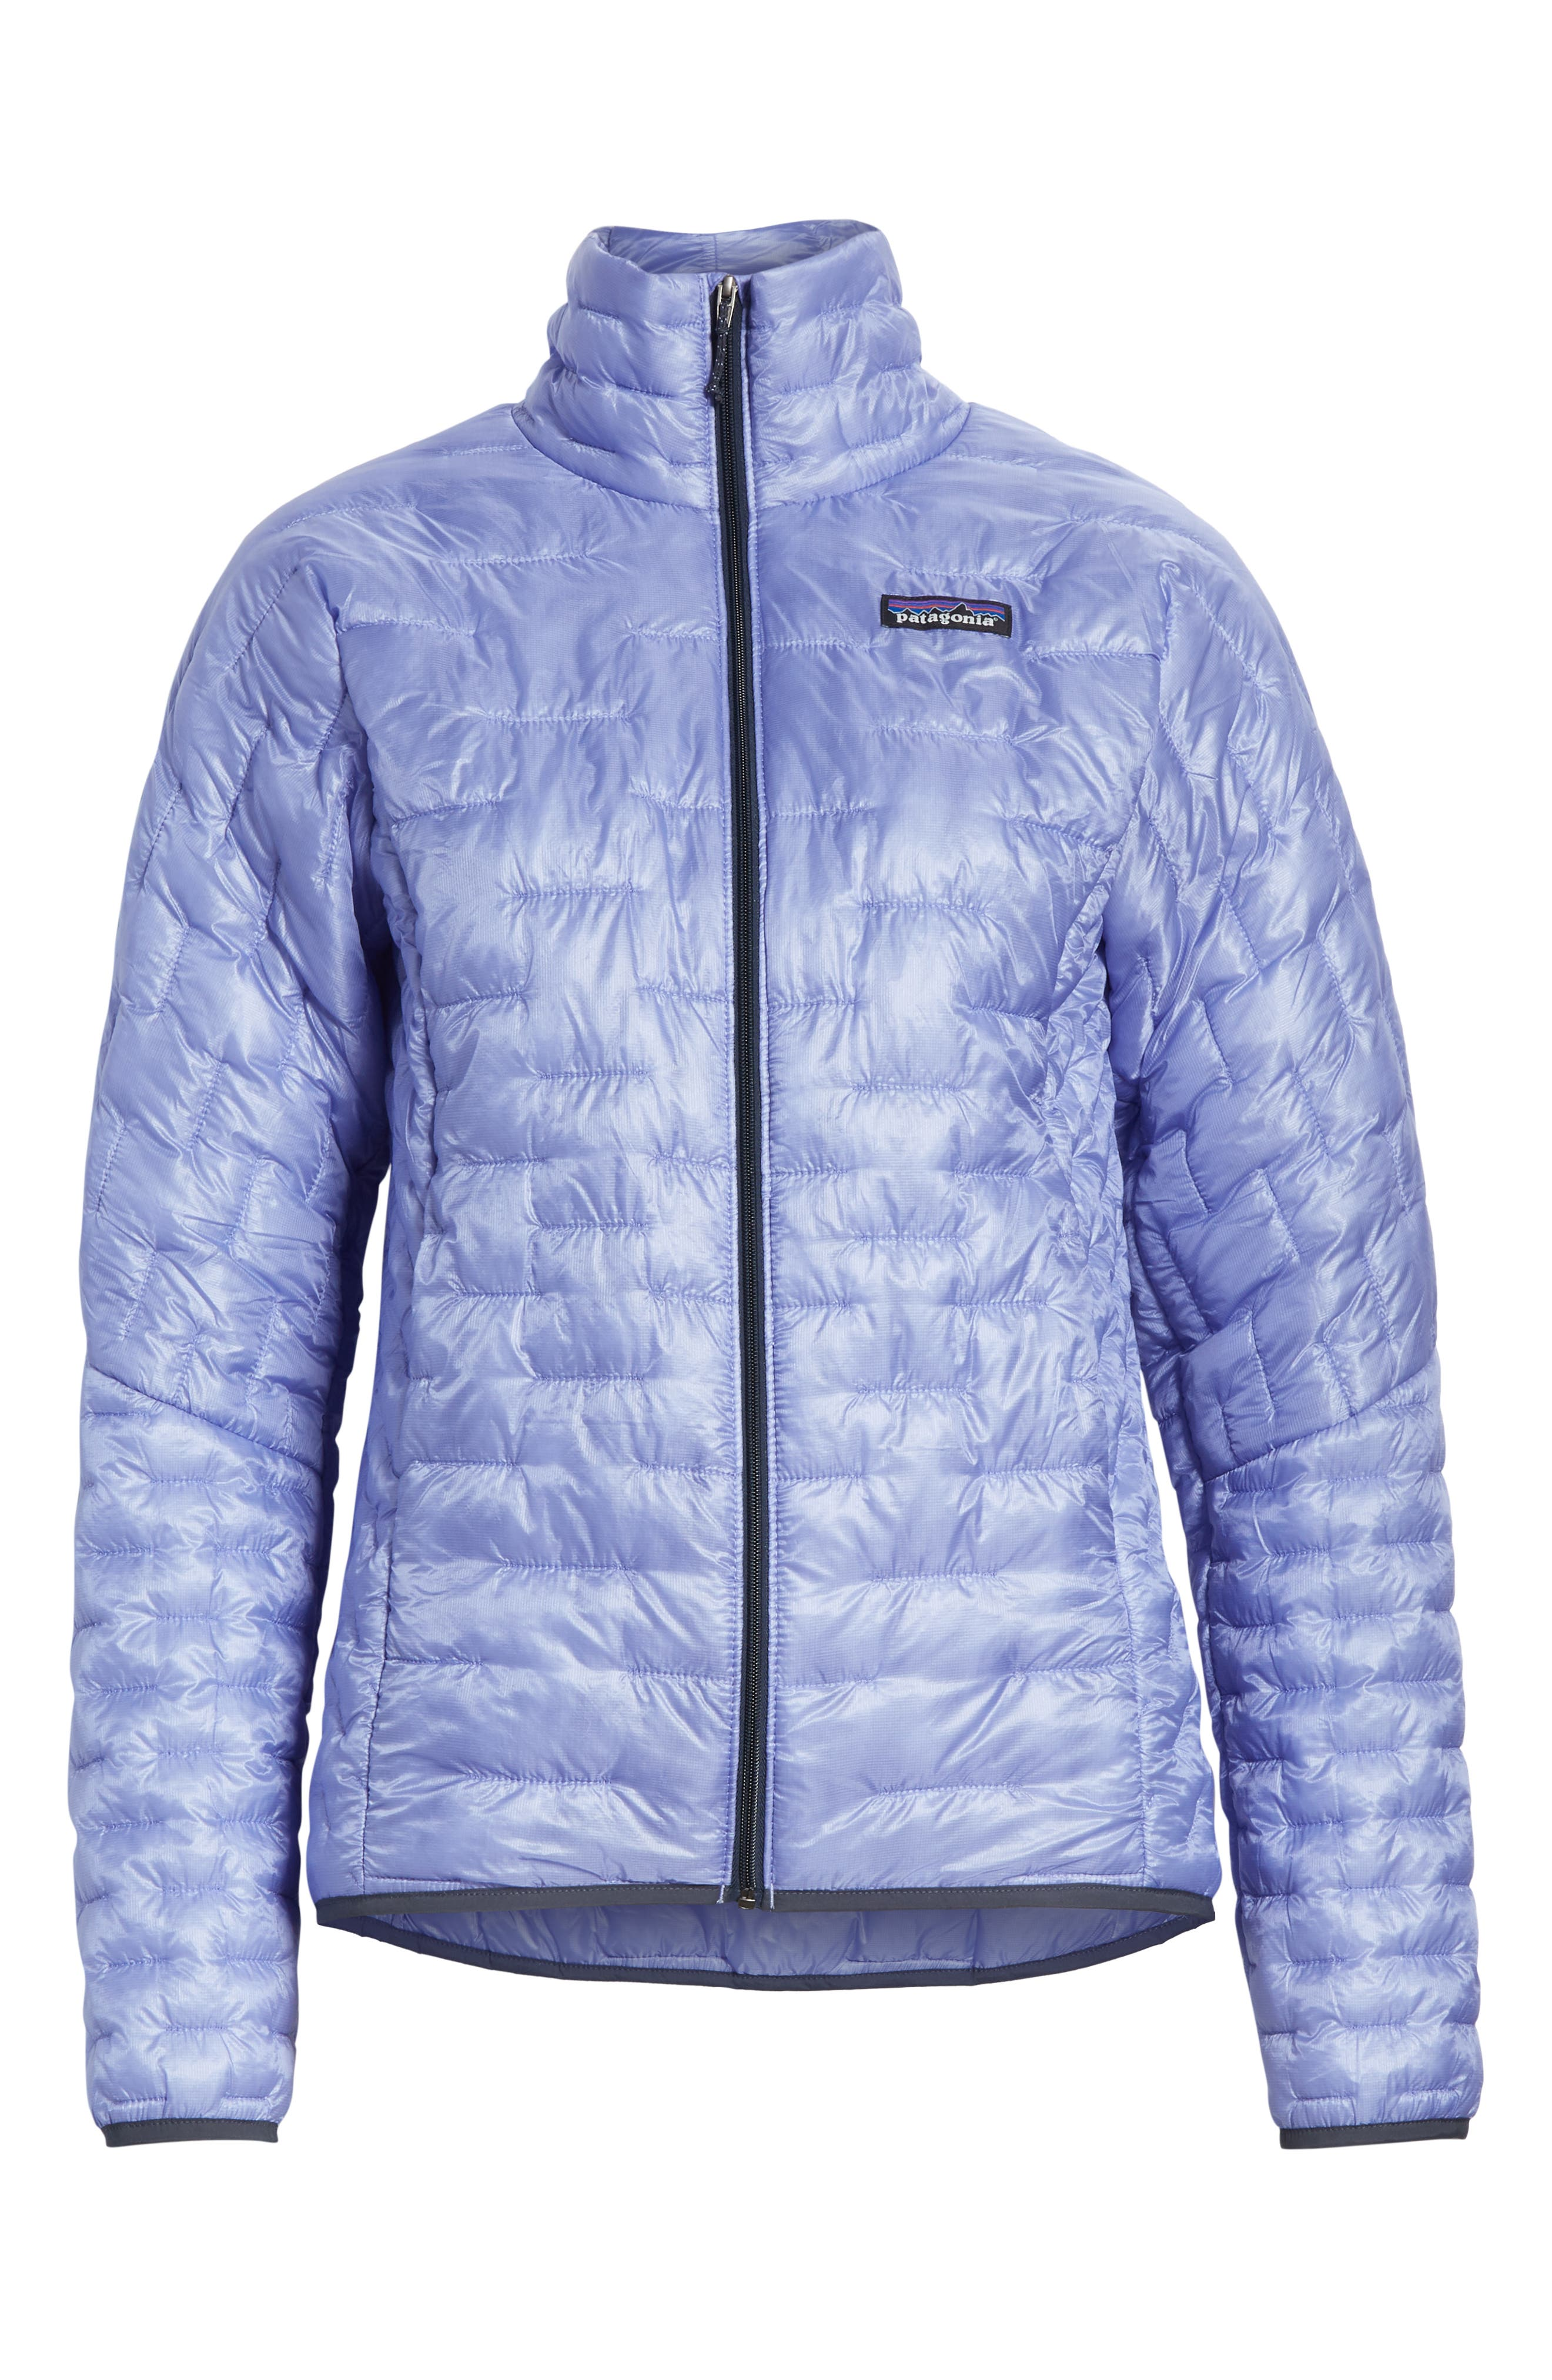 Patagonia Micro Puff Jacket, Blue